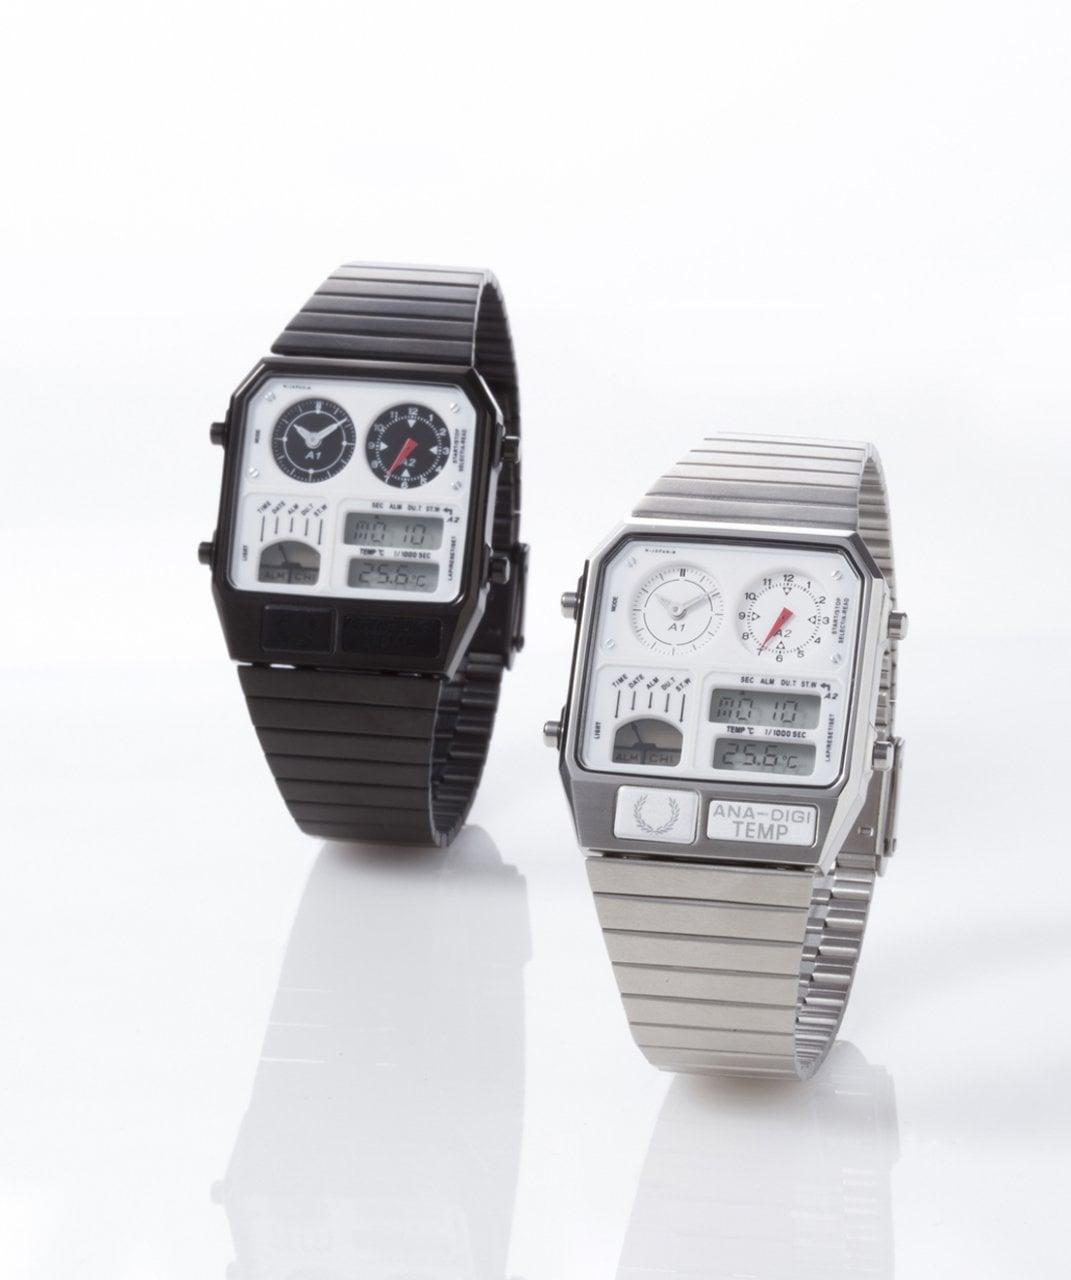 # ANA-DIGI TEMP for FRED PERRY 復刻經典星辰錶:復古與時尚的絕佳聯名 1